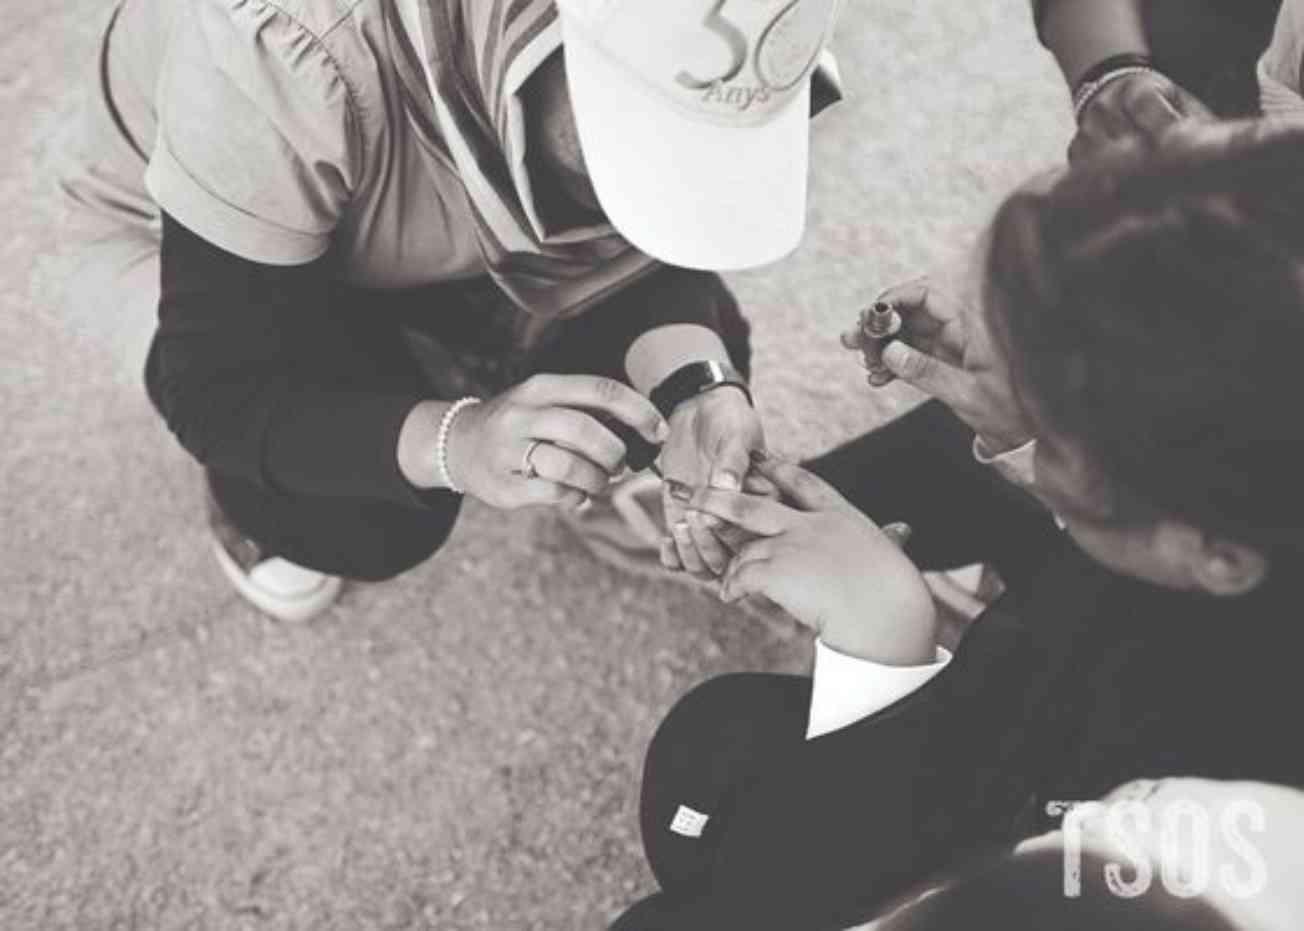 Mosumas Daughters Painting Fingernails